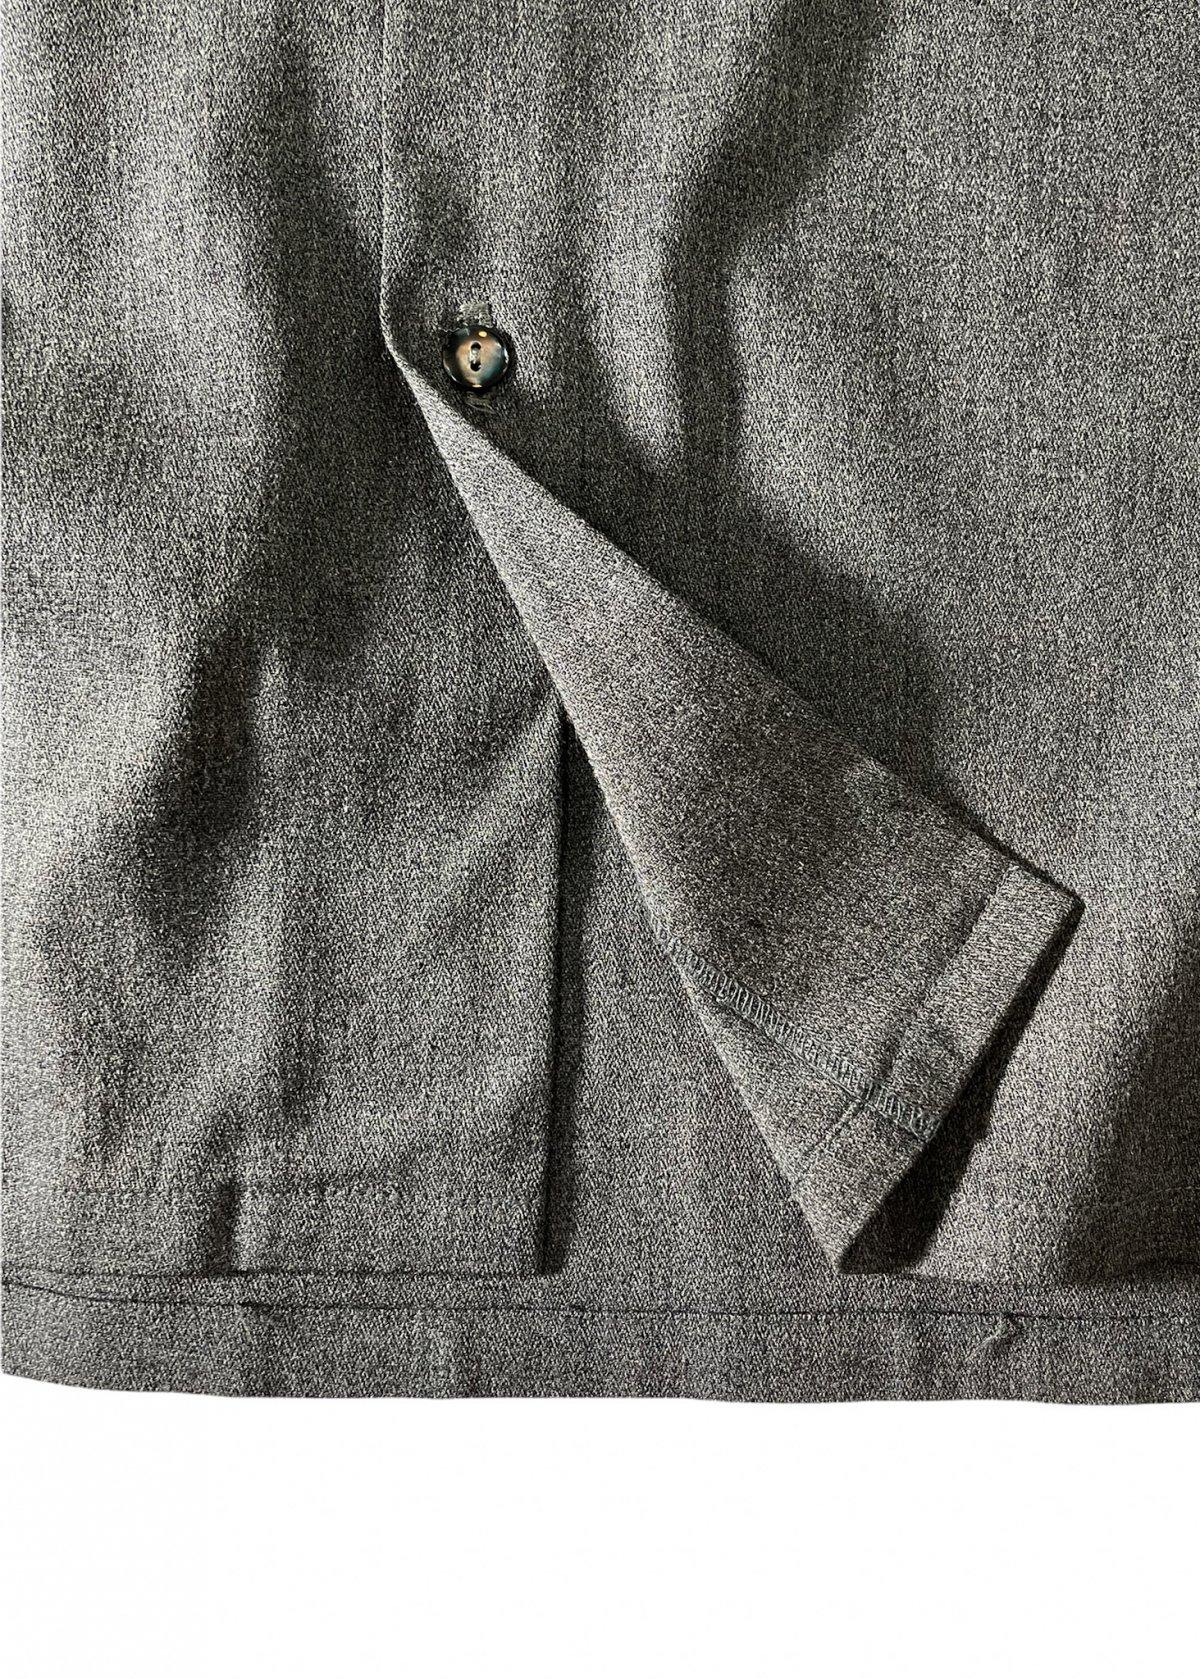 I&I 古着 通販 Vintage Wool Mix wide Shirt 詳細画像10